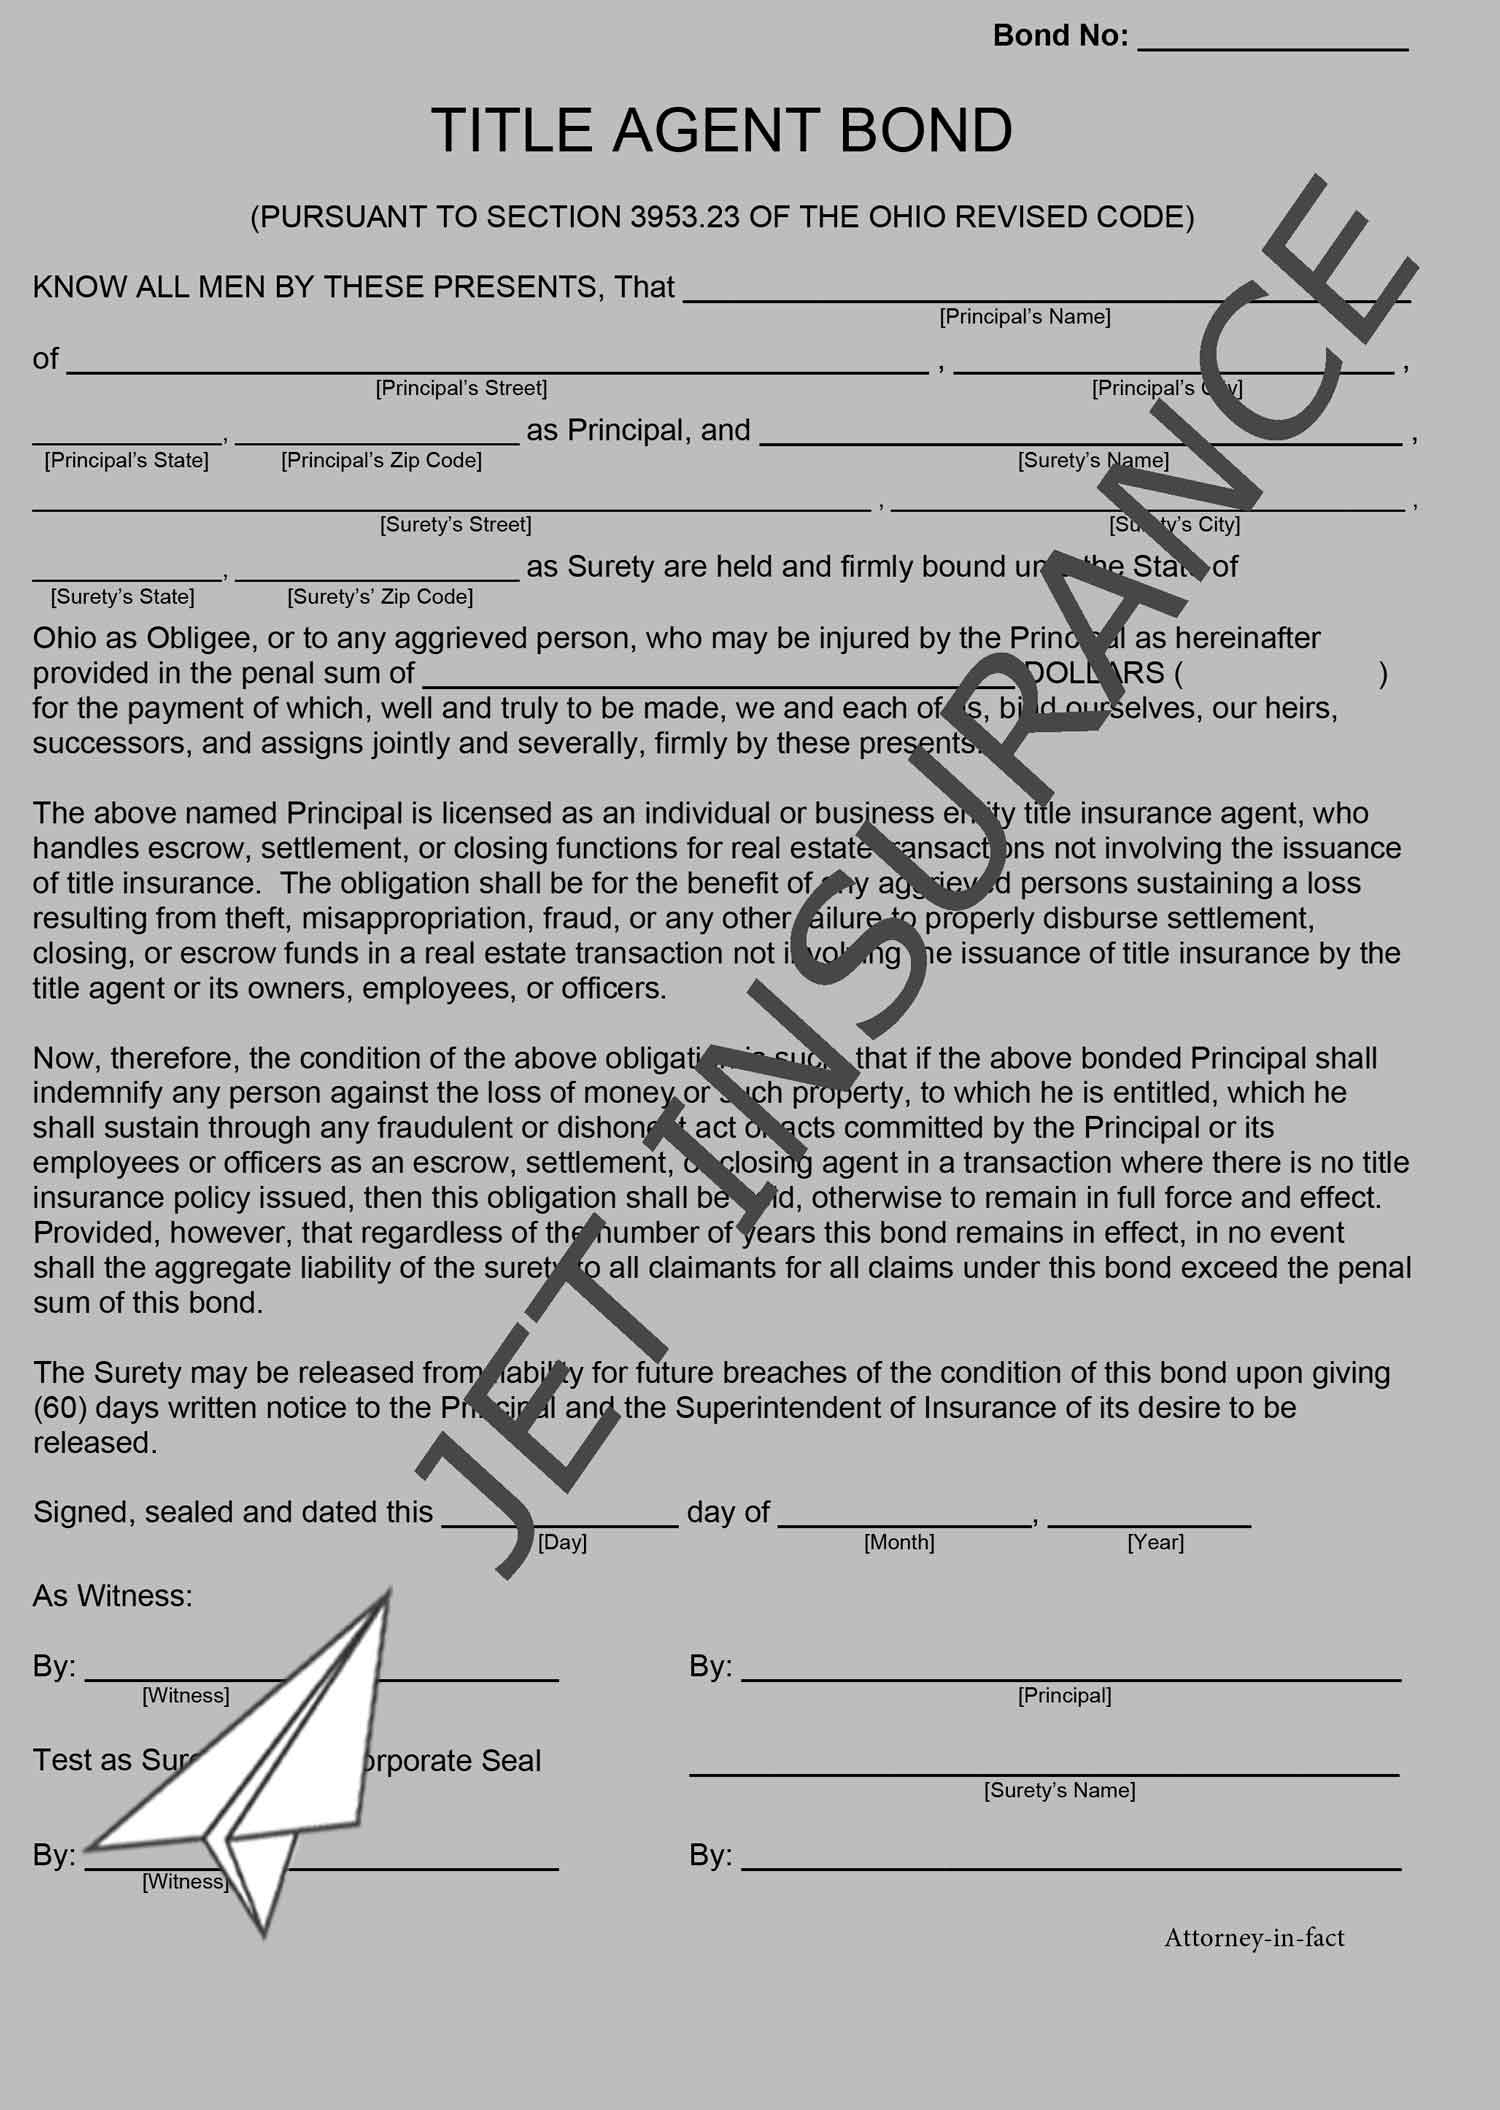 Ohio Title Agent Bond Form